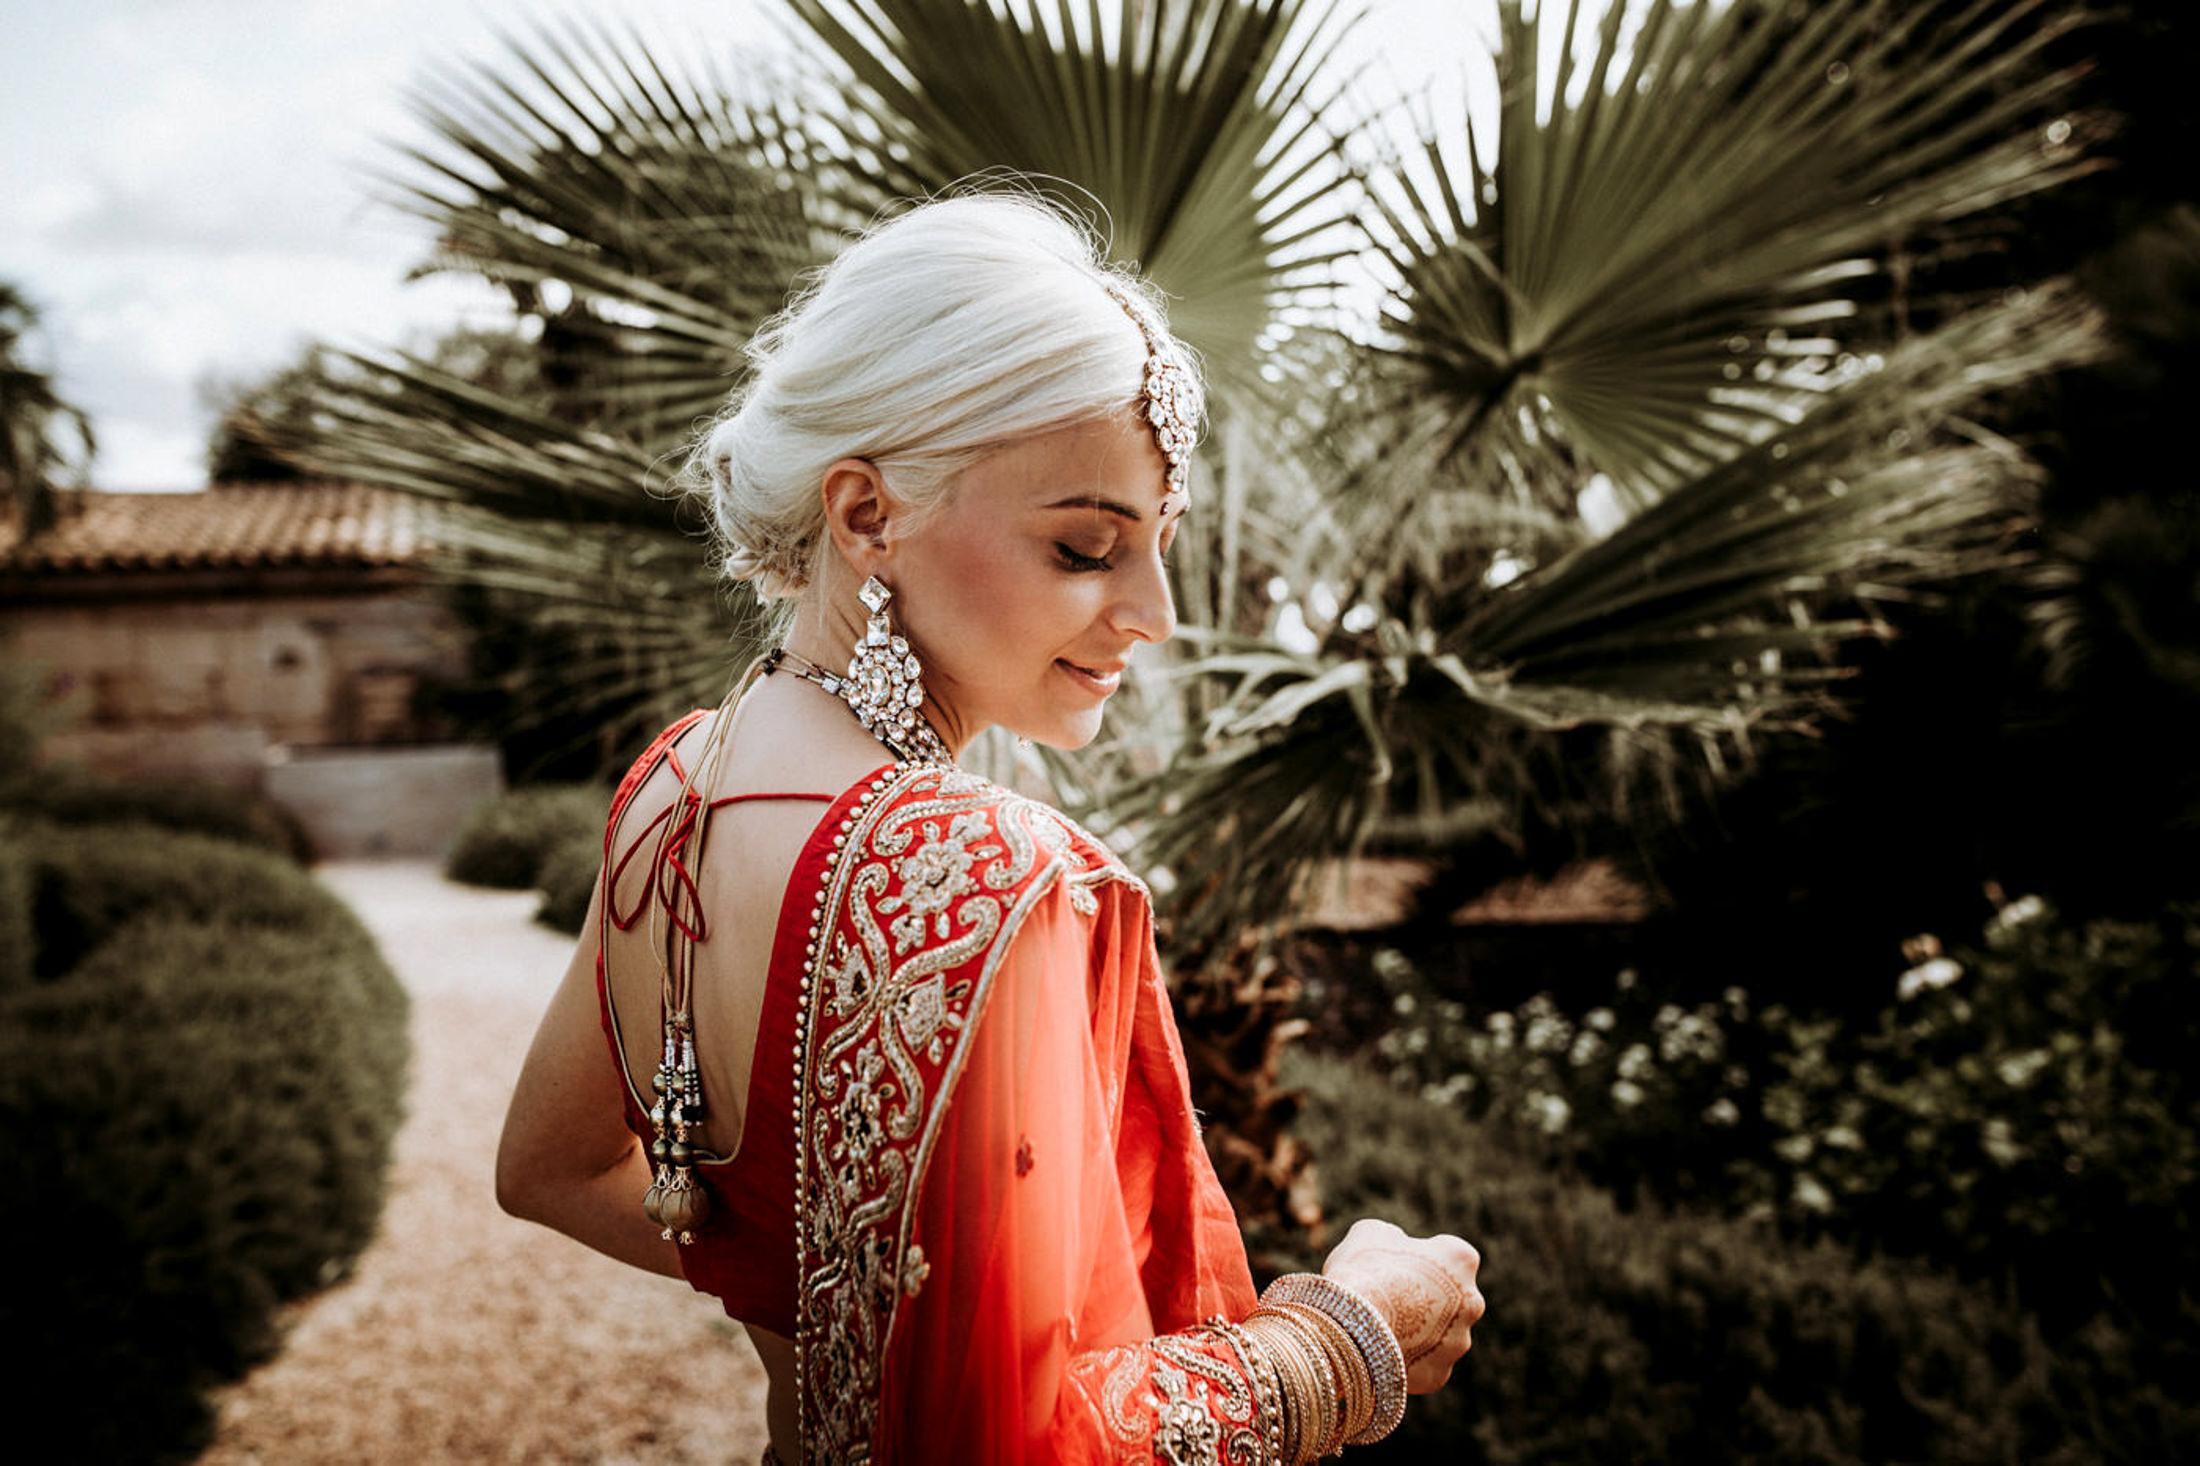 Wedding_Photographer_Mallorca_Daniela-Marquardt_Photography_New_York_Iceland_Tuscany_Santorini_Portugal_Austria_Bavaria_Elopement_Hochzeitsfotograf_AntjeRajat2_65